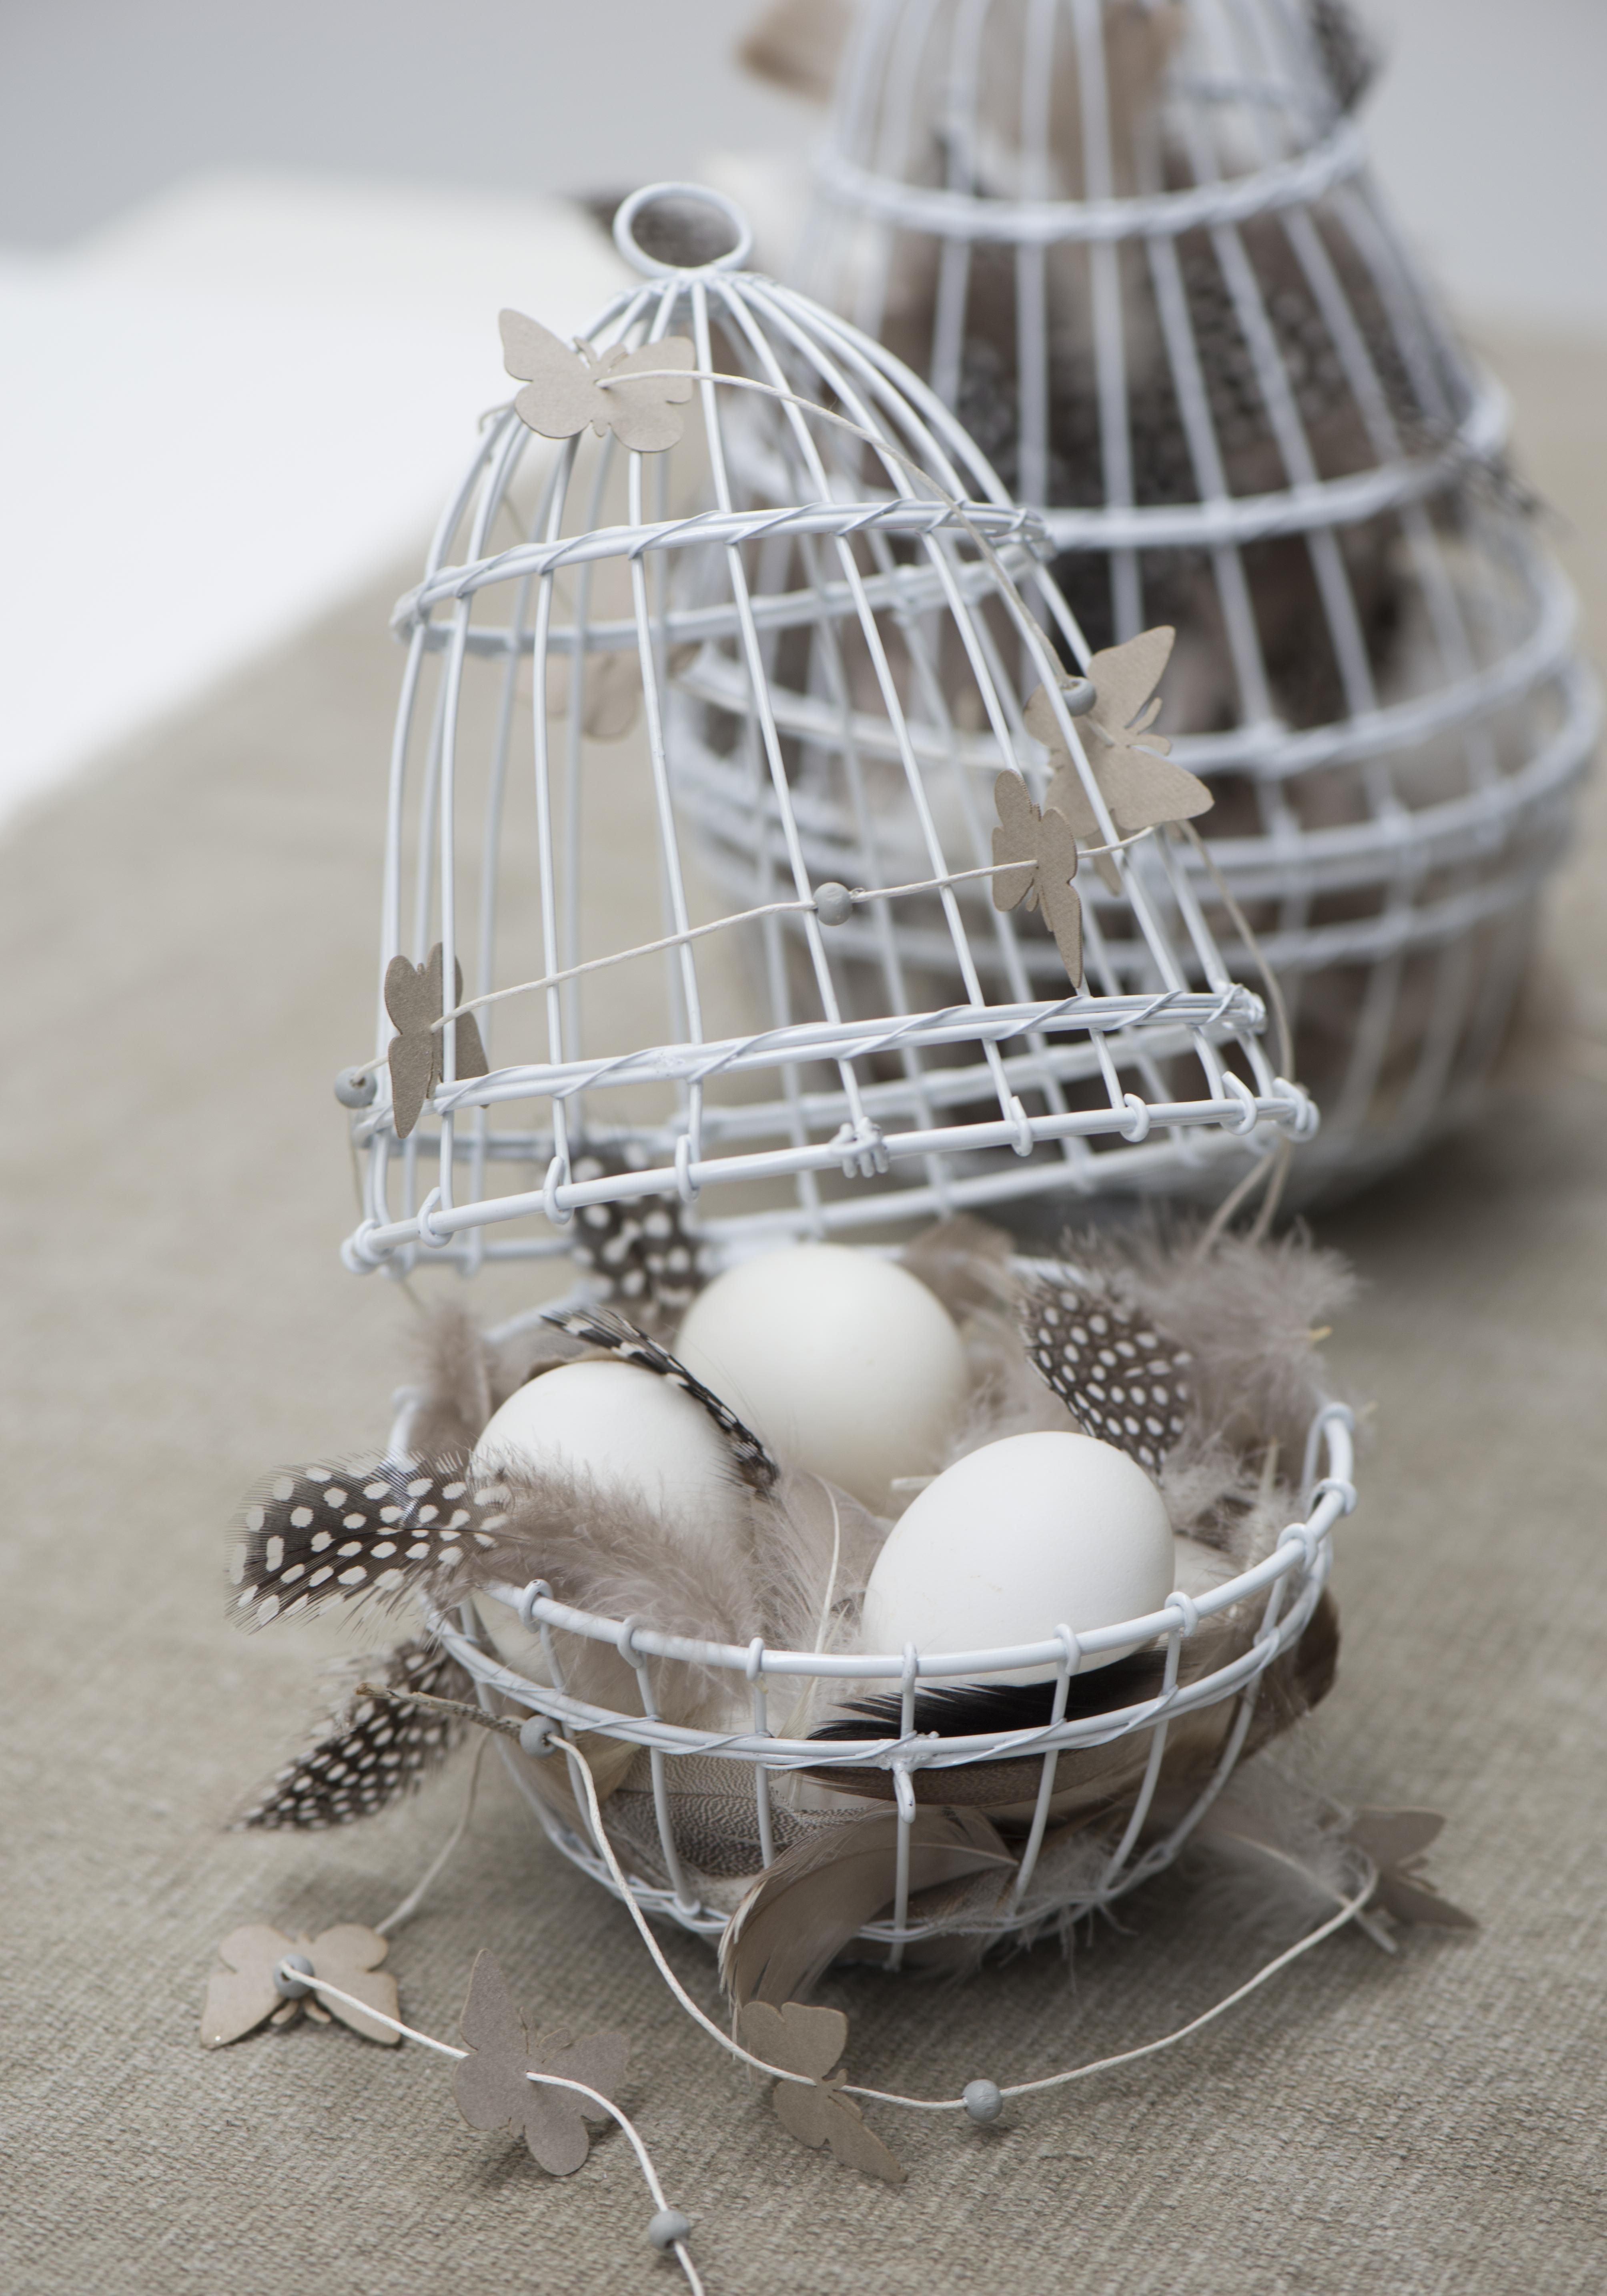 White Metal Wire Egg Hanging Basket Holder Set of 2 by Ib Laursen